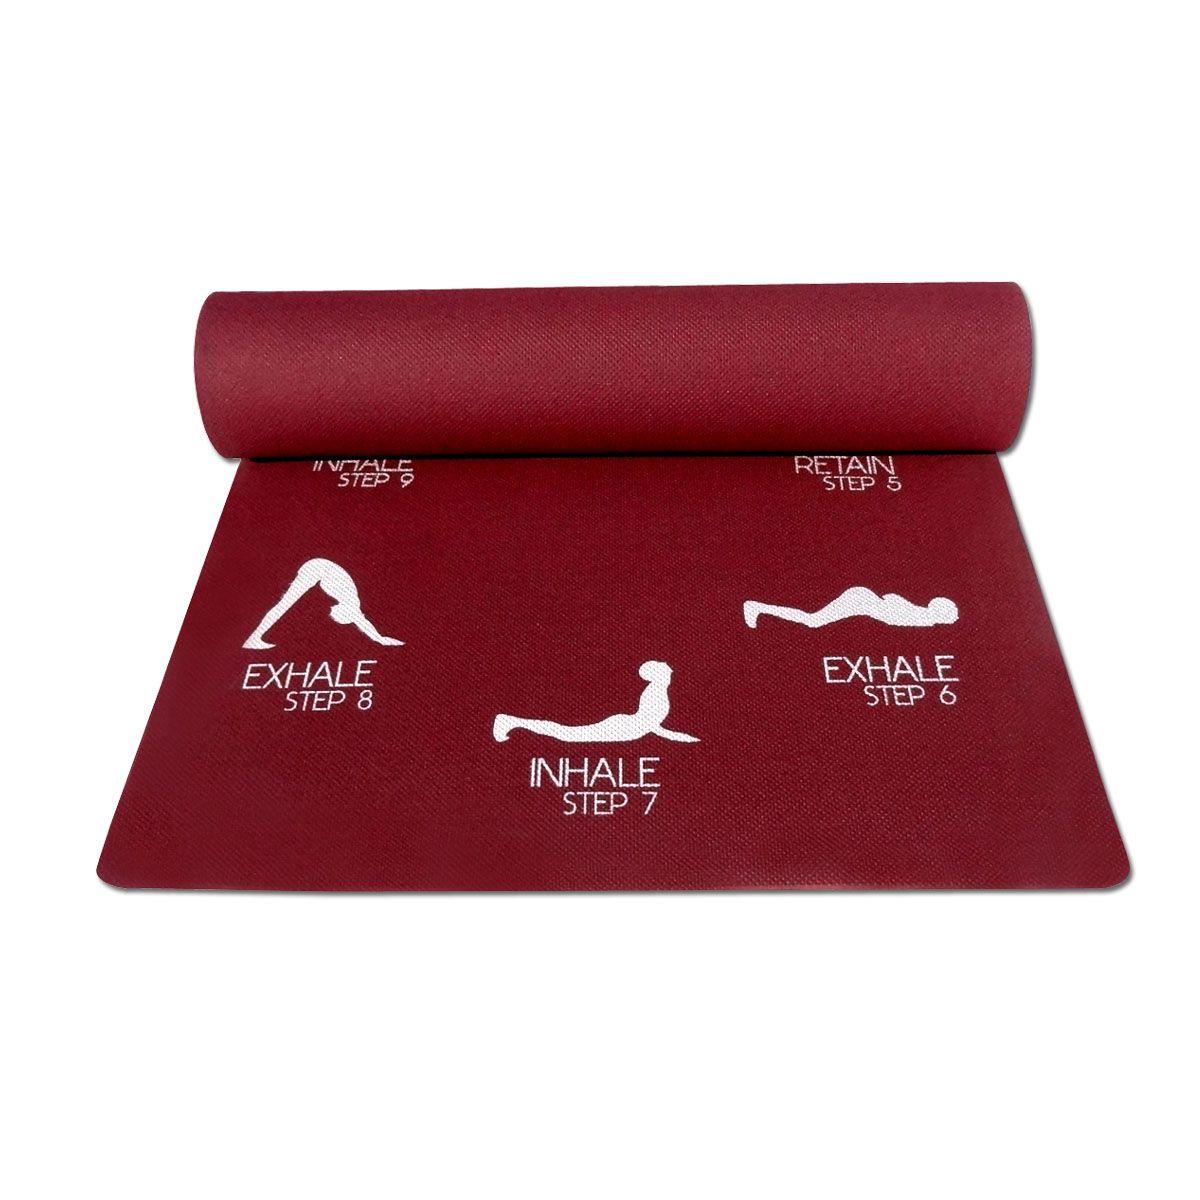 Fitnessmatsindia Aerolite Deals In World Class Yogamats Yoga Meditation Accessories The Technology We Meditation Accessories Yoga Mat Yoga Meditation